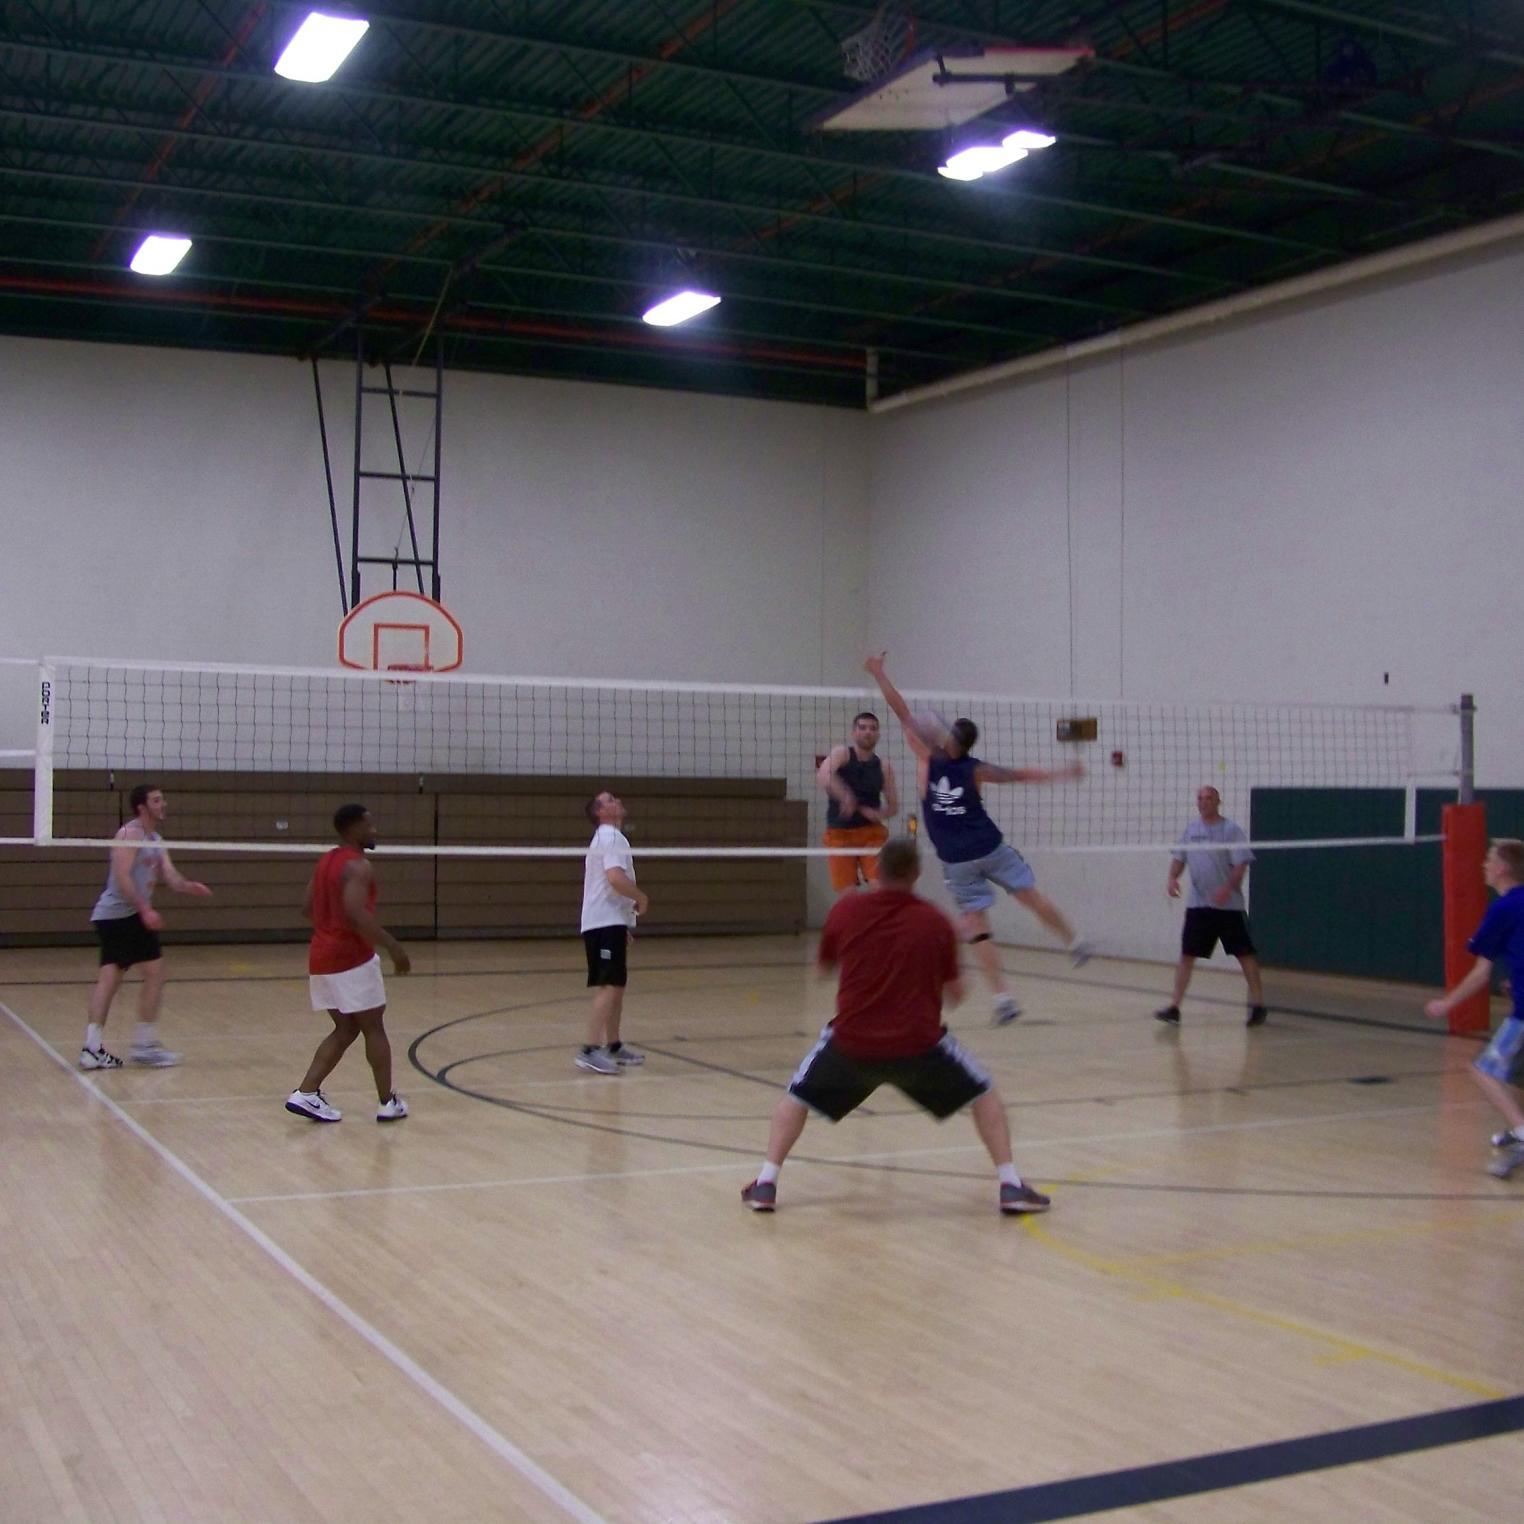 Gym - Volleyball